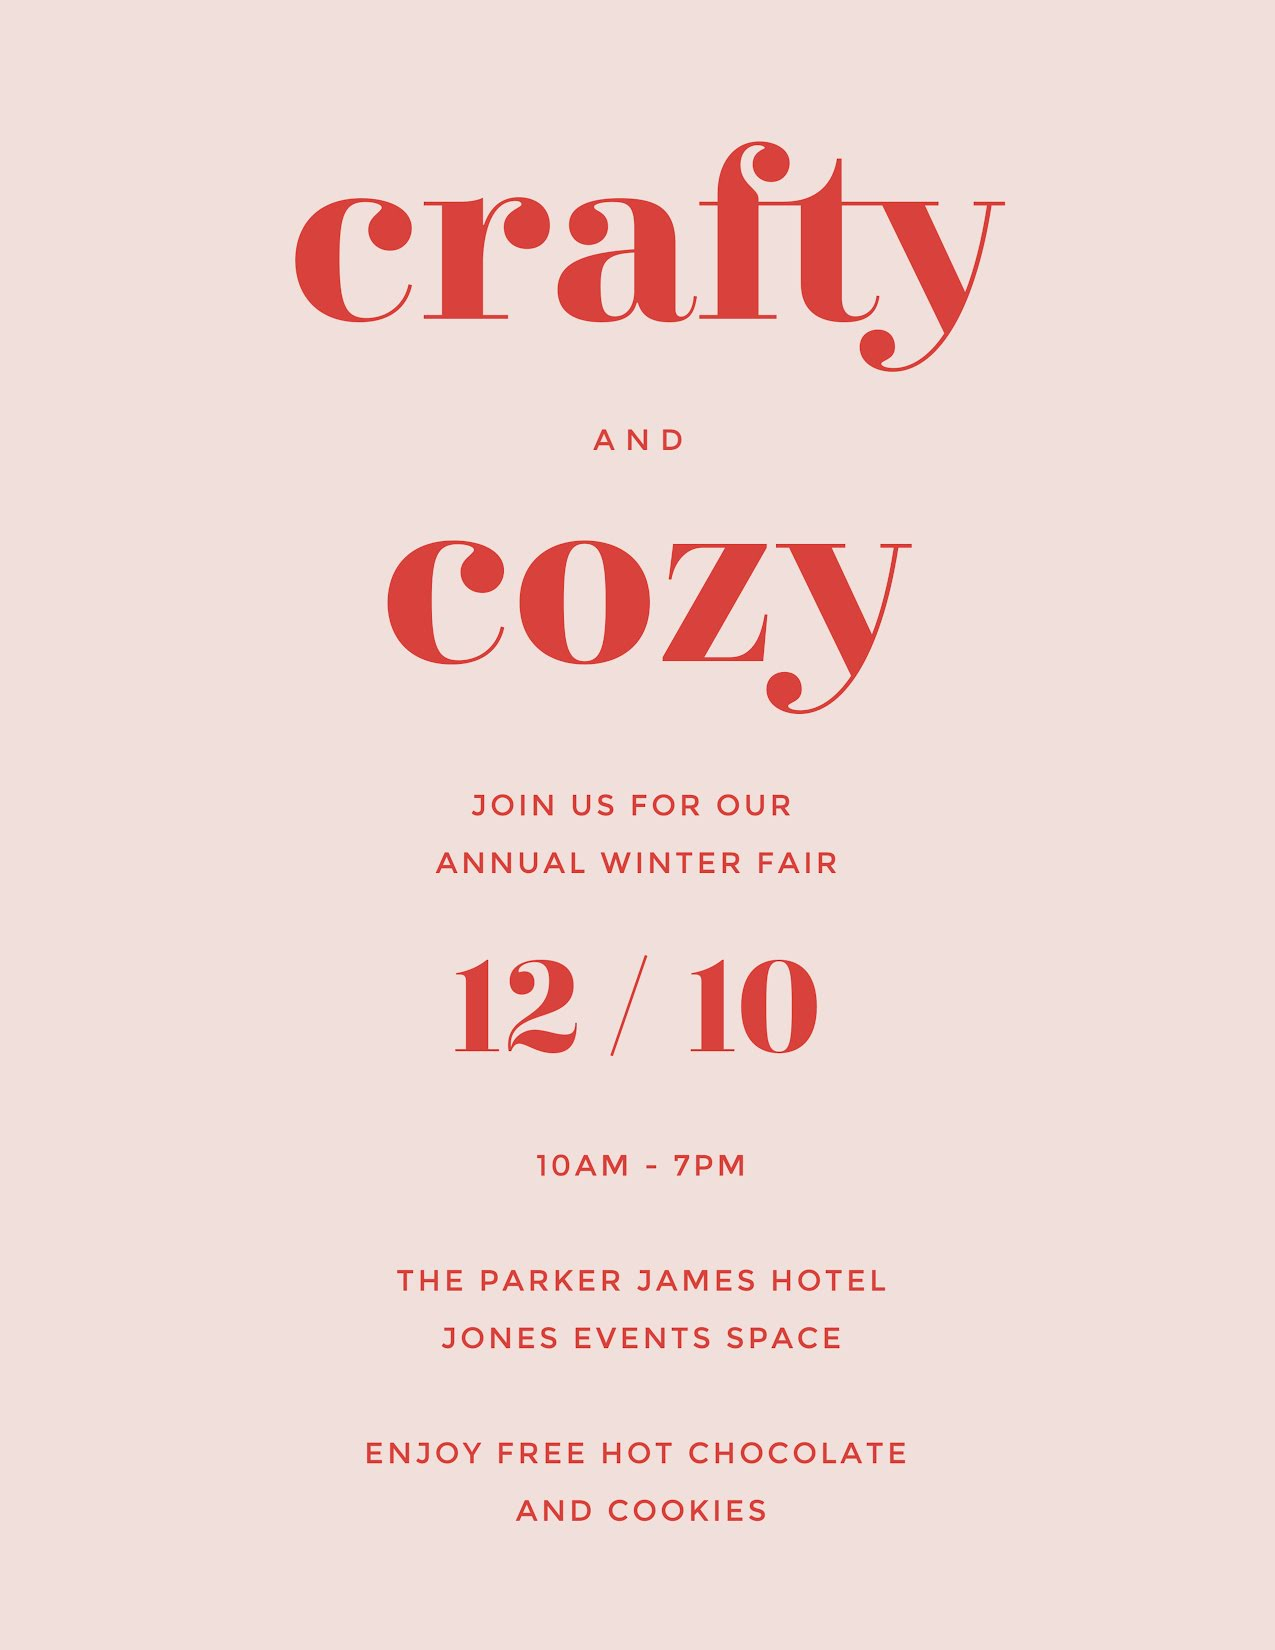 Crafty & Cozy - Flyer Template